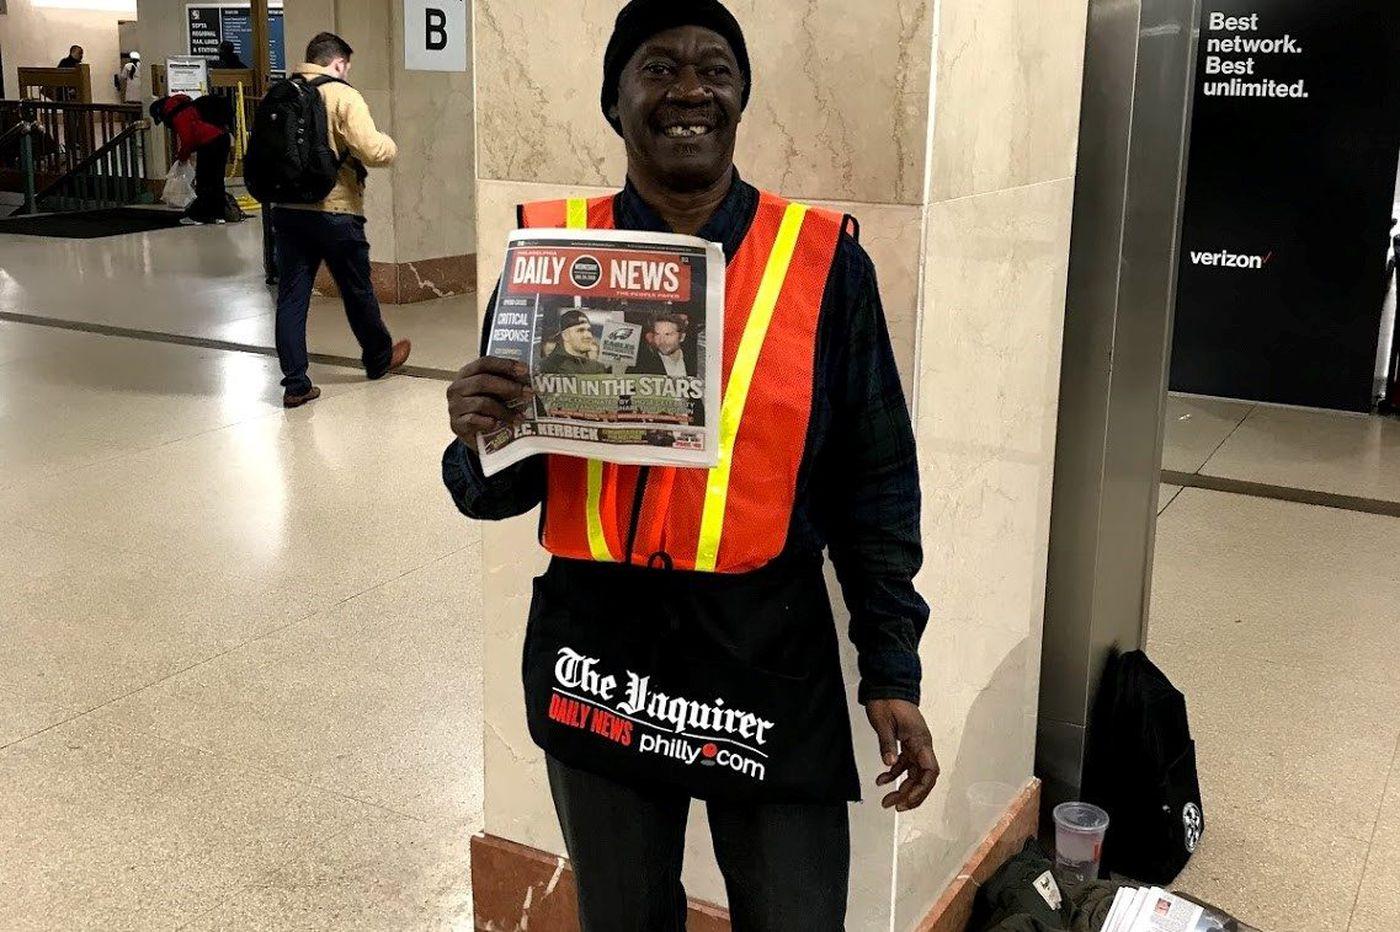 At Septa Suburban Station, newspapers make a comeback